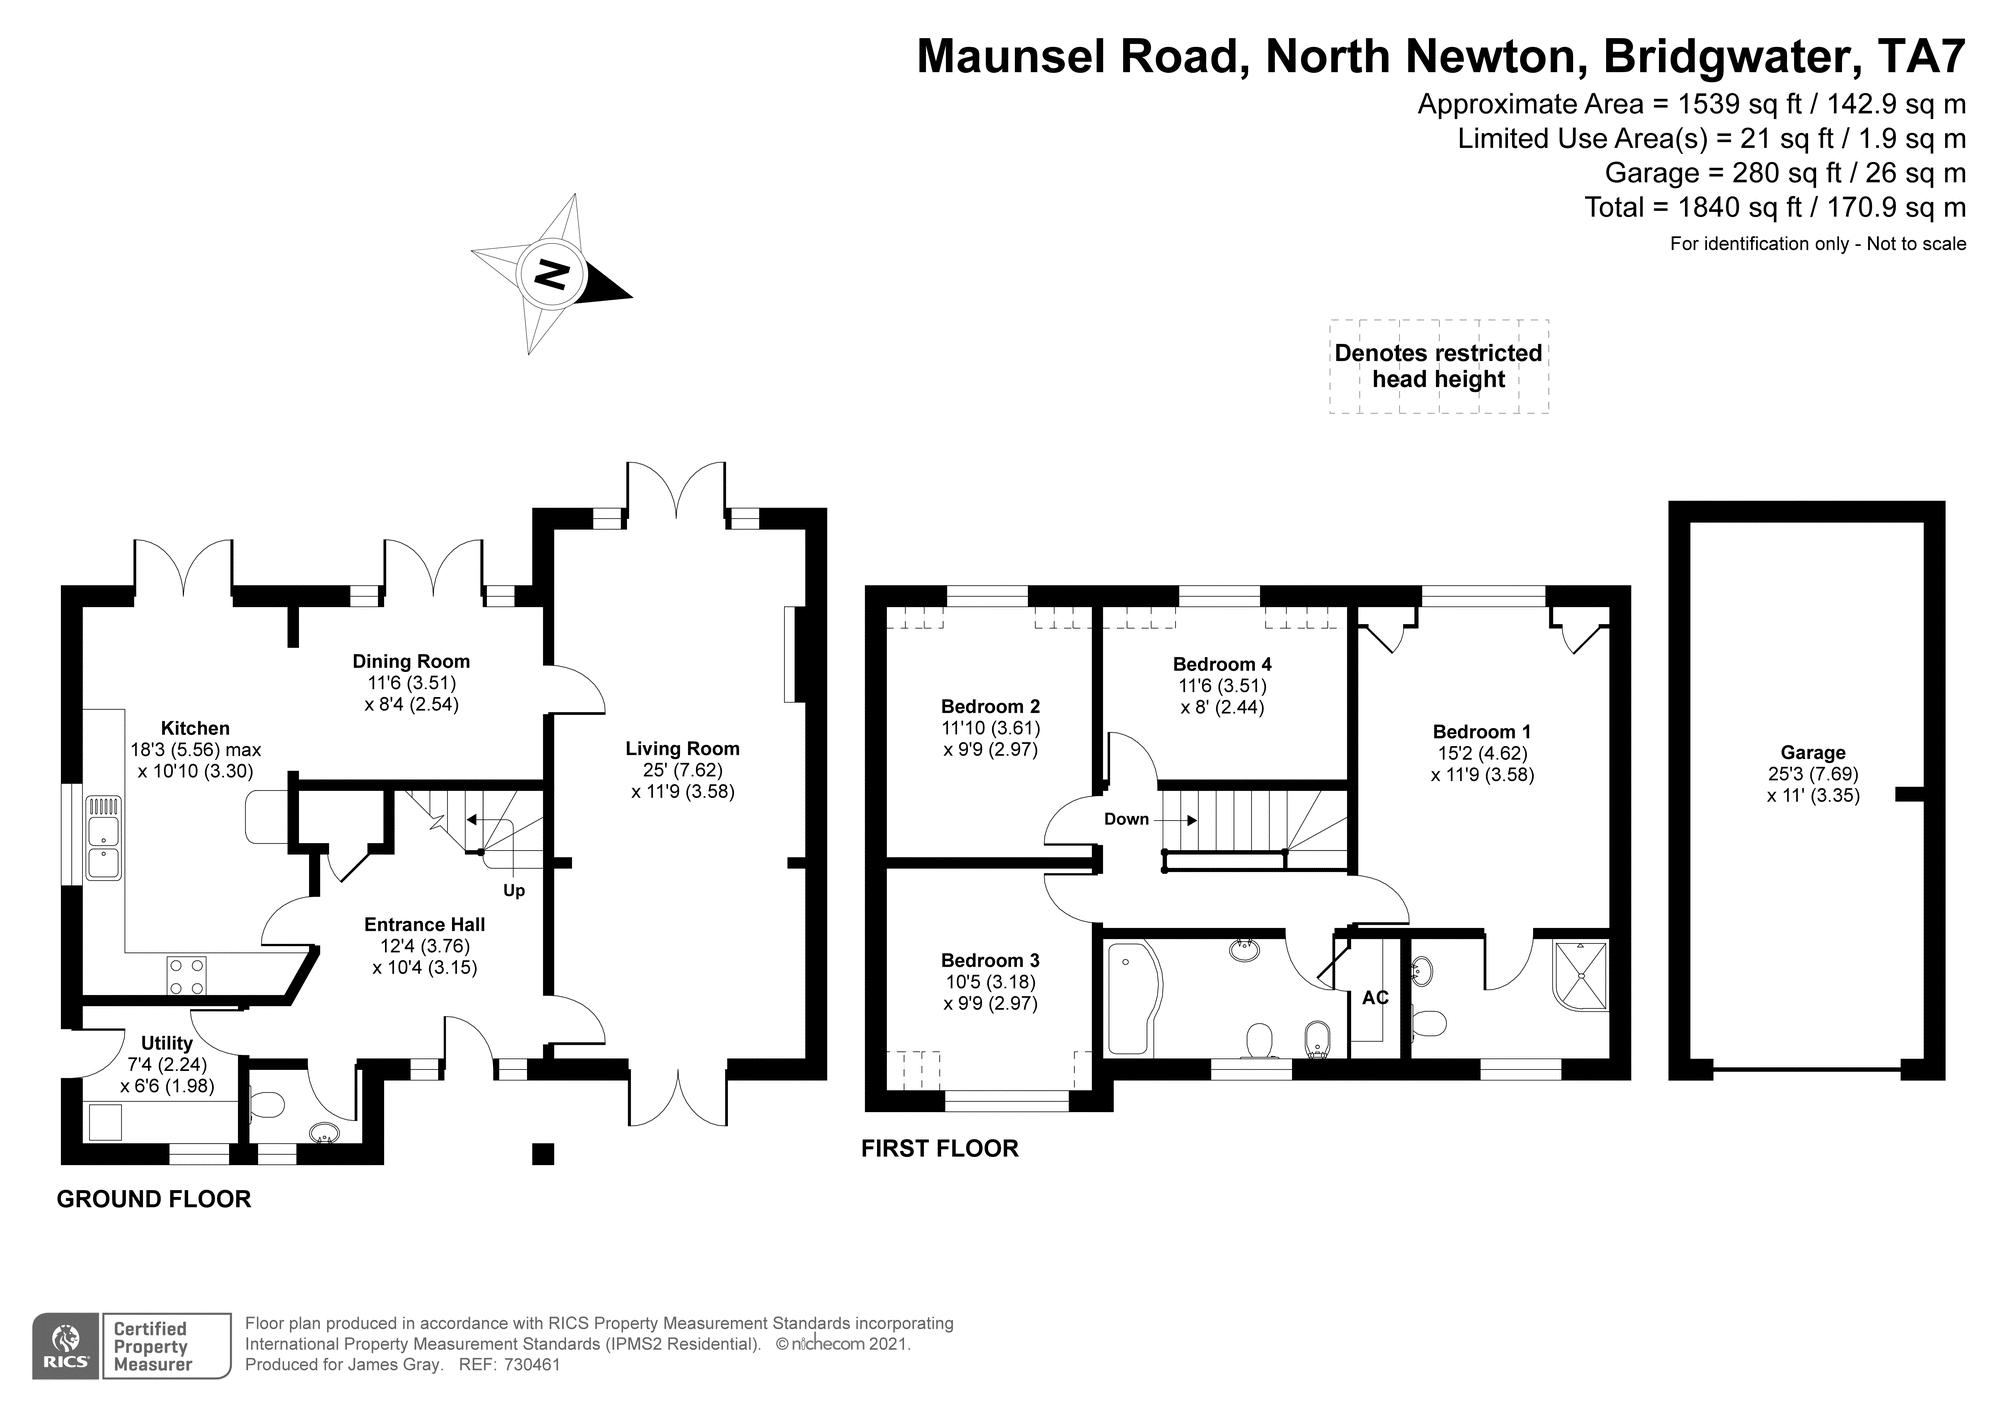 Maunsel Road North Newton